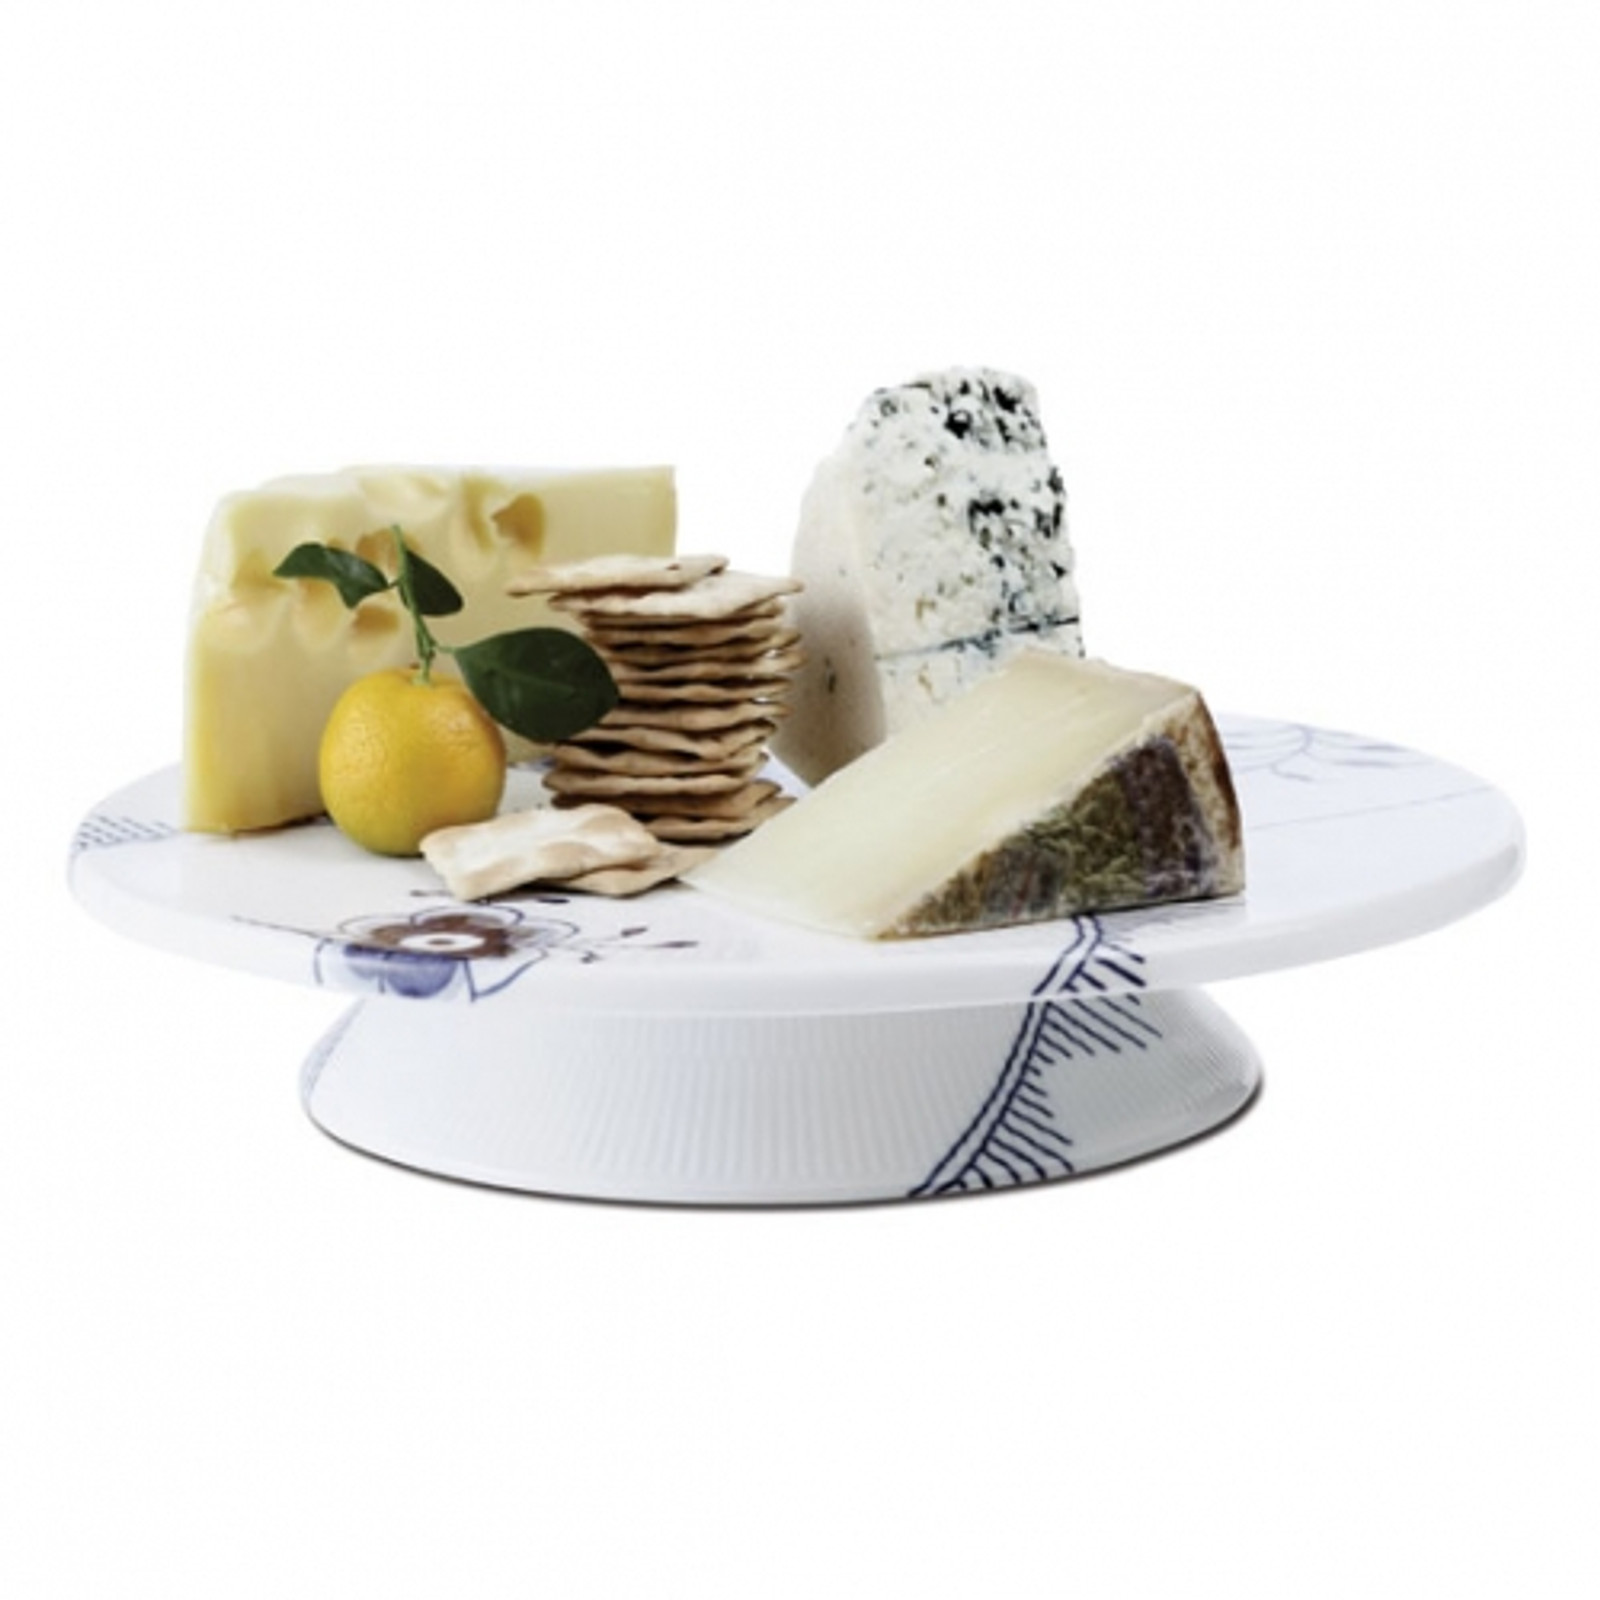 "Royal Copenhagen Blue Fluted Mega Cake Plate, 12.5"""